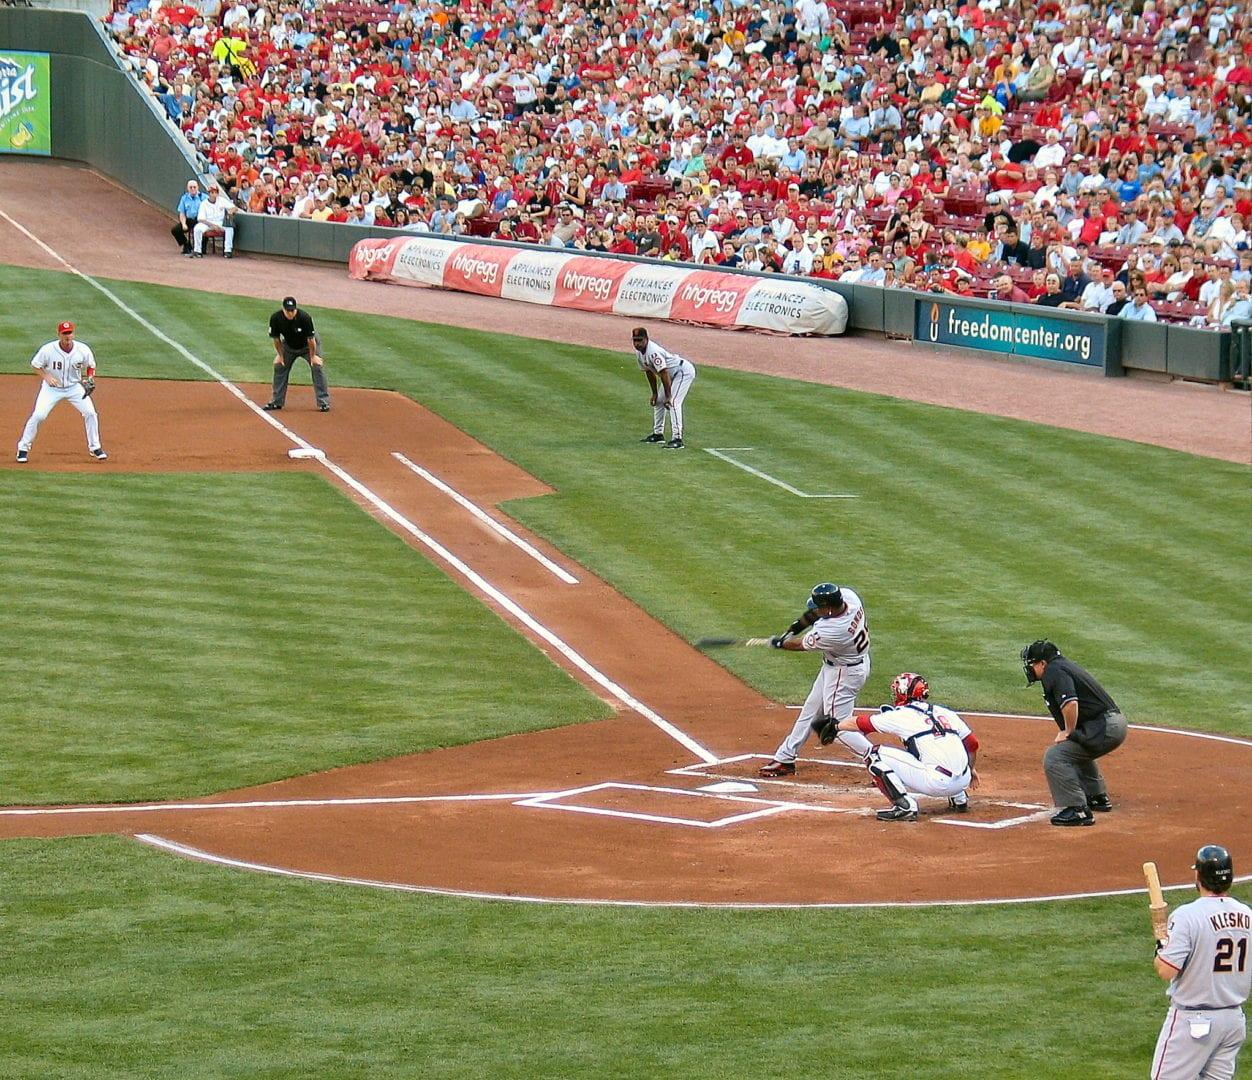 The batter doing a strike